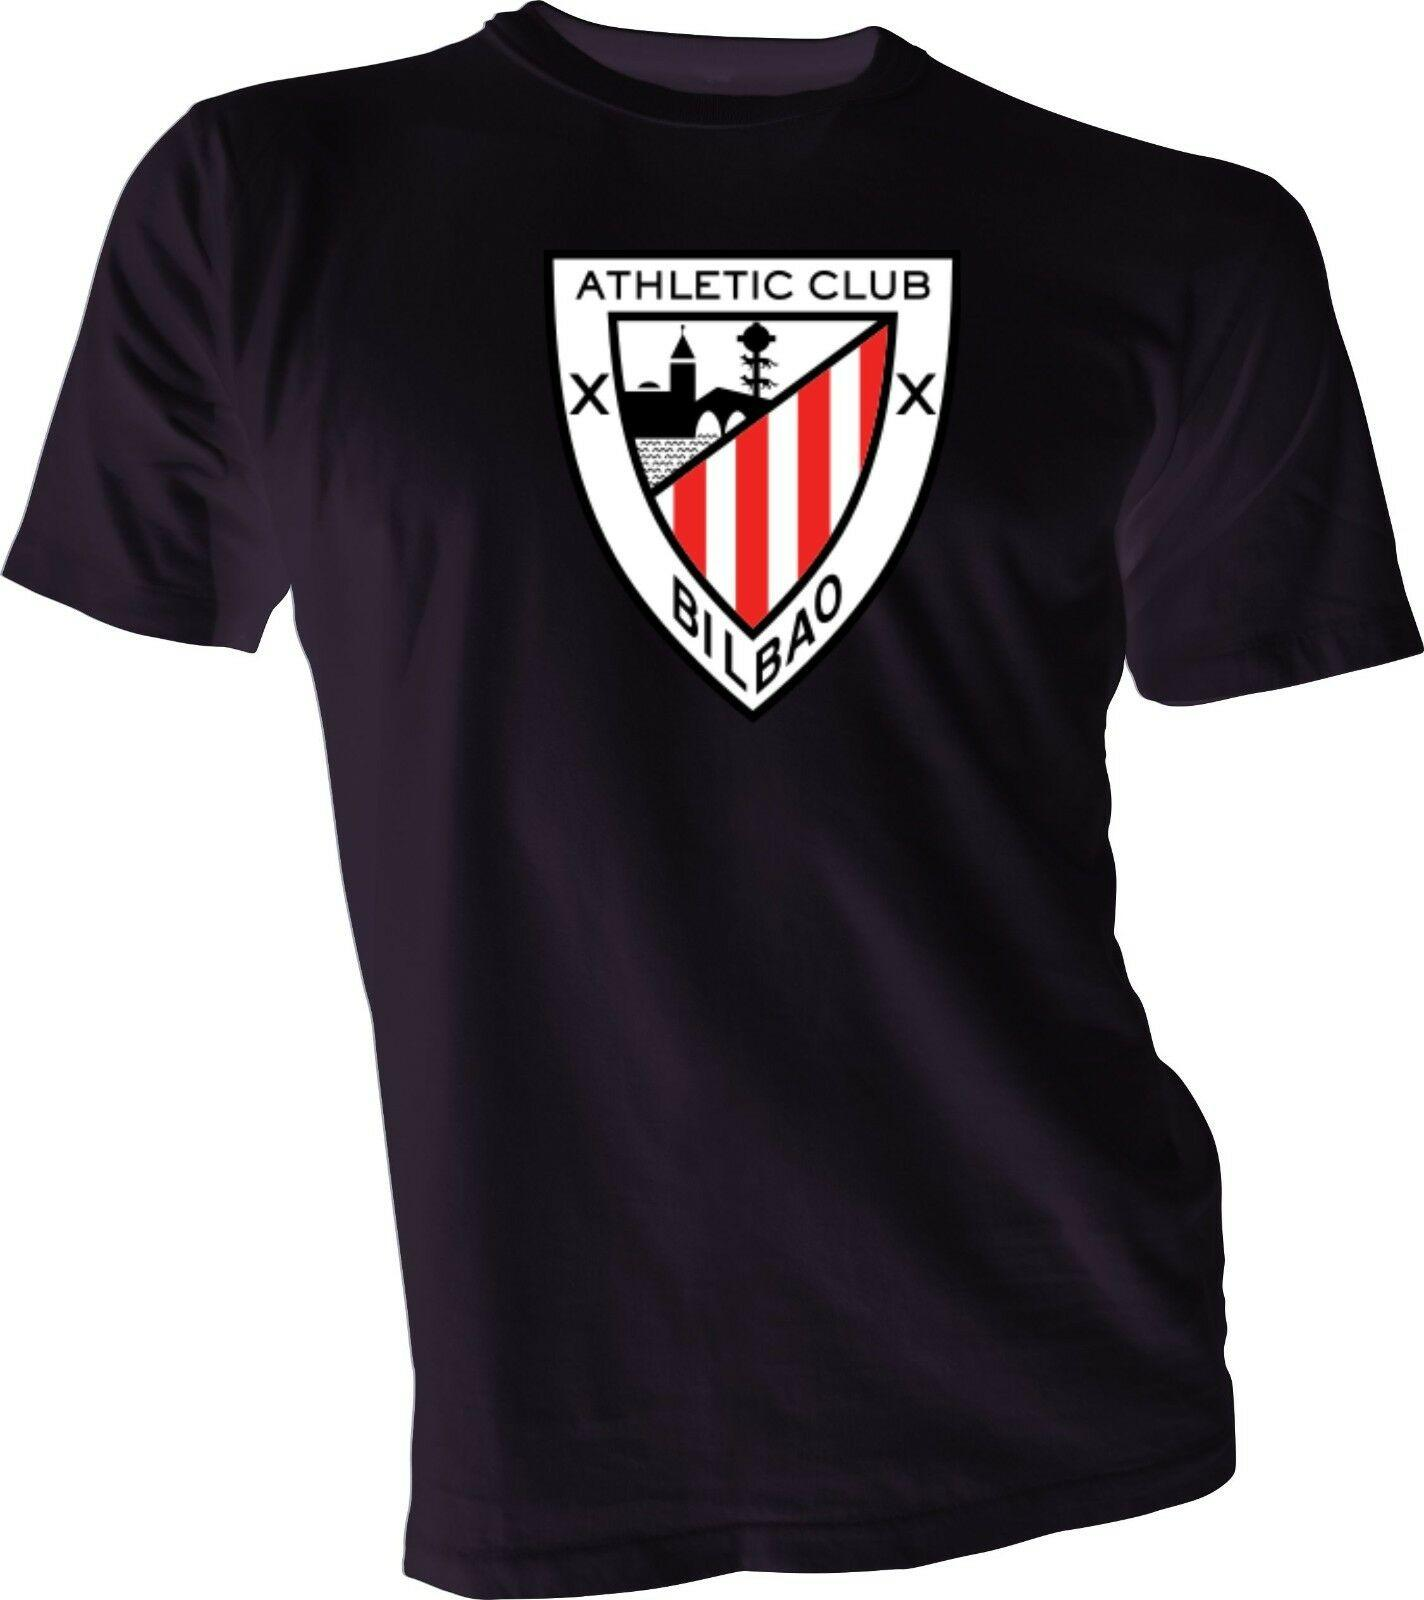 Athletic Club Bilbao Los Leones Spanien La Liga Fußball-Schwarz-T-Shirt NEW